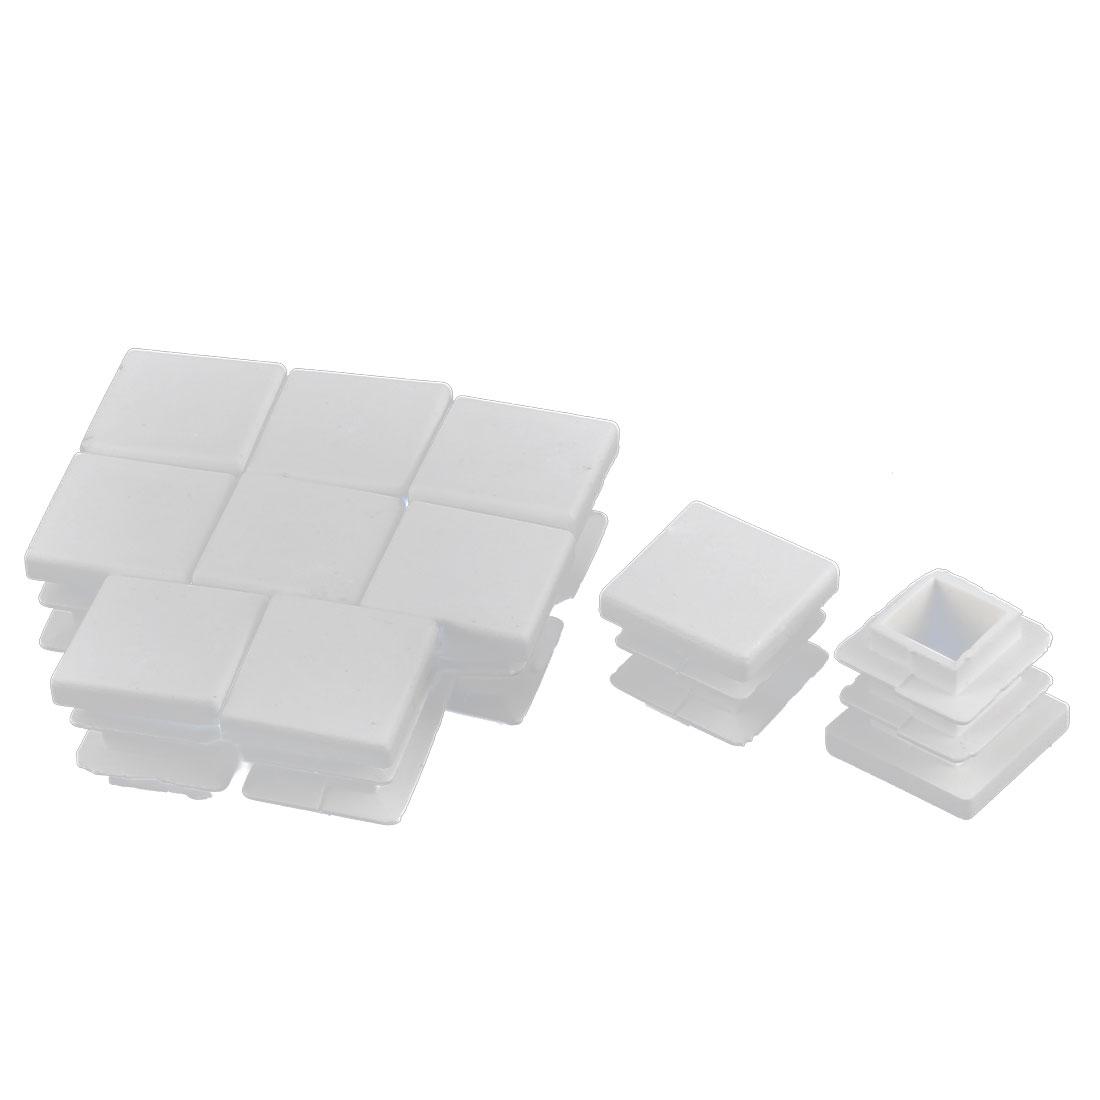 Furniture Desk Chair Legs Plastic Square Tube Pipe Insert Cover End Caps White 16 x 16mm 10pcs